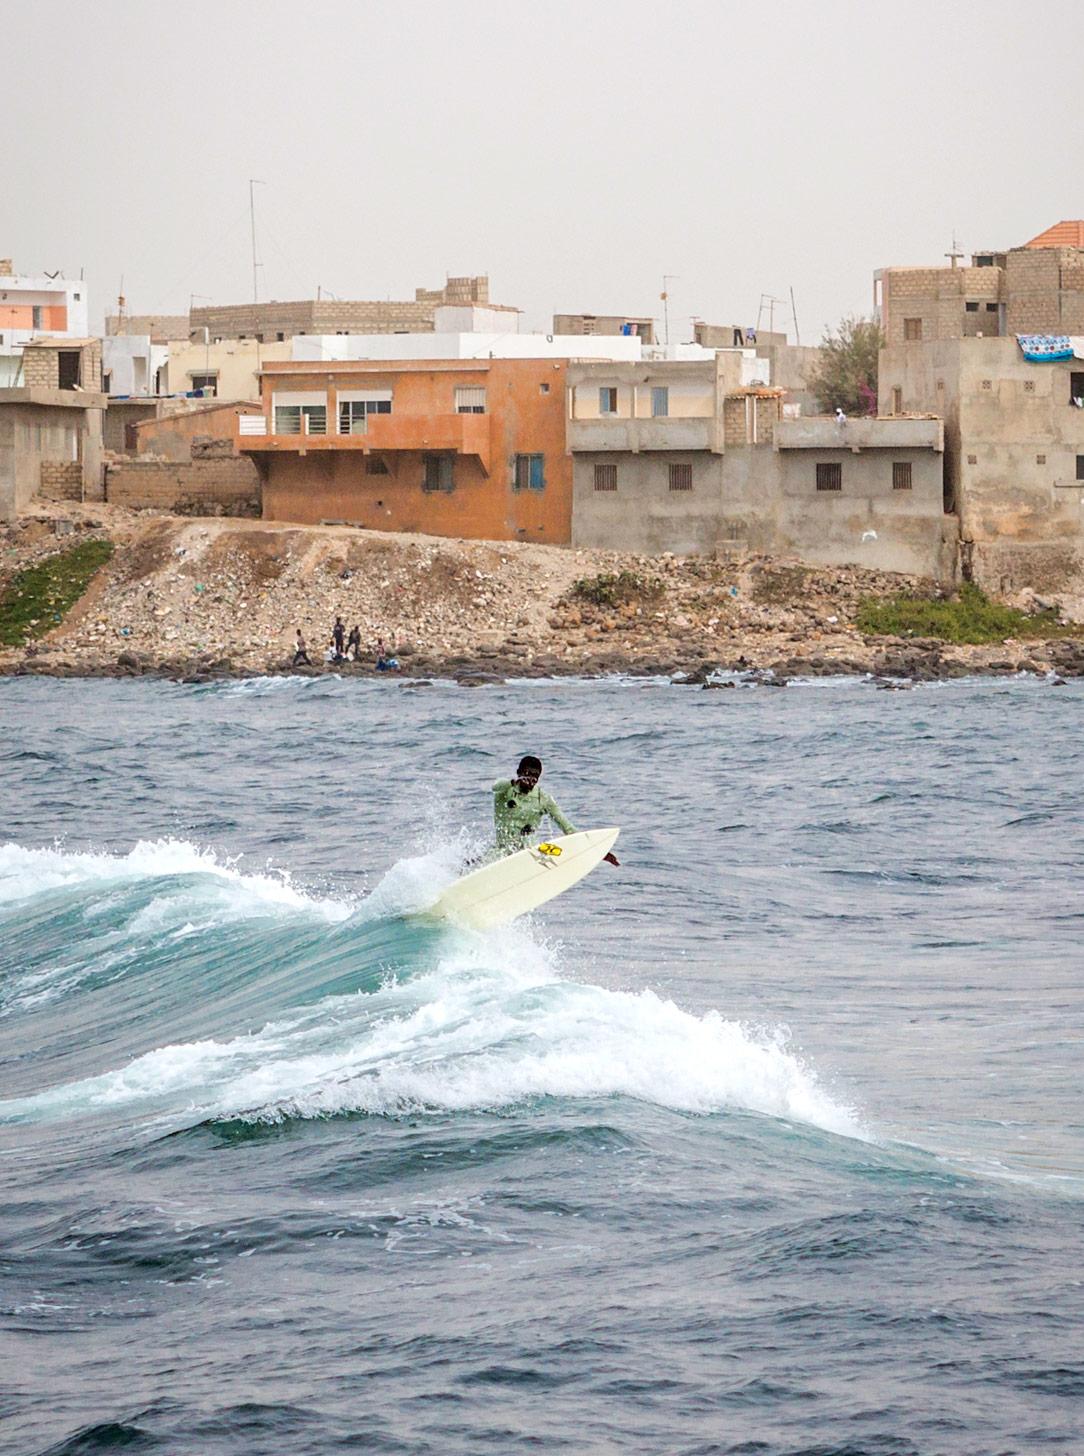 senegal-surfer-cutback_BobbiLe-Ba-Photography_2015-525